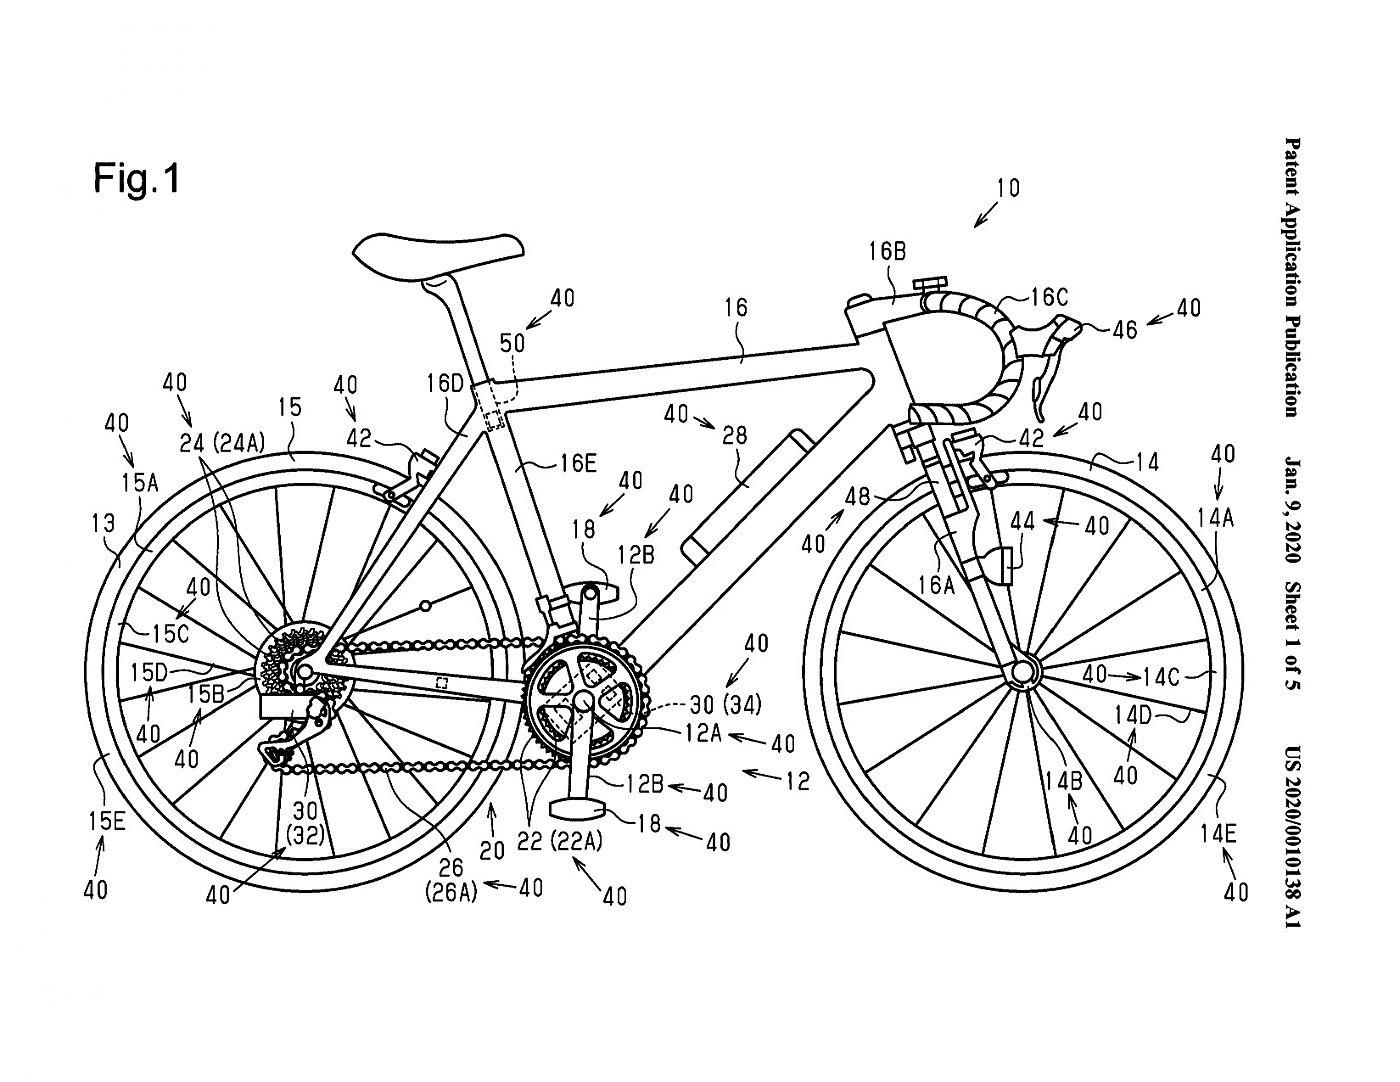 p22_patent_imageflip.jpg